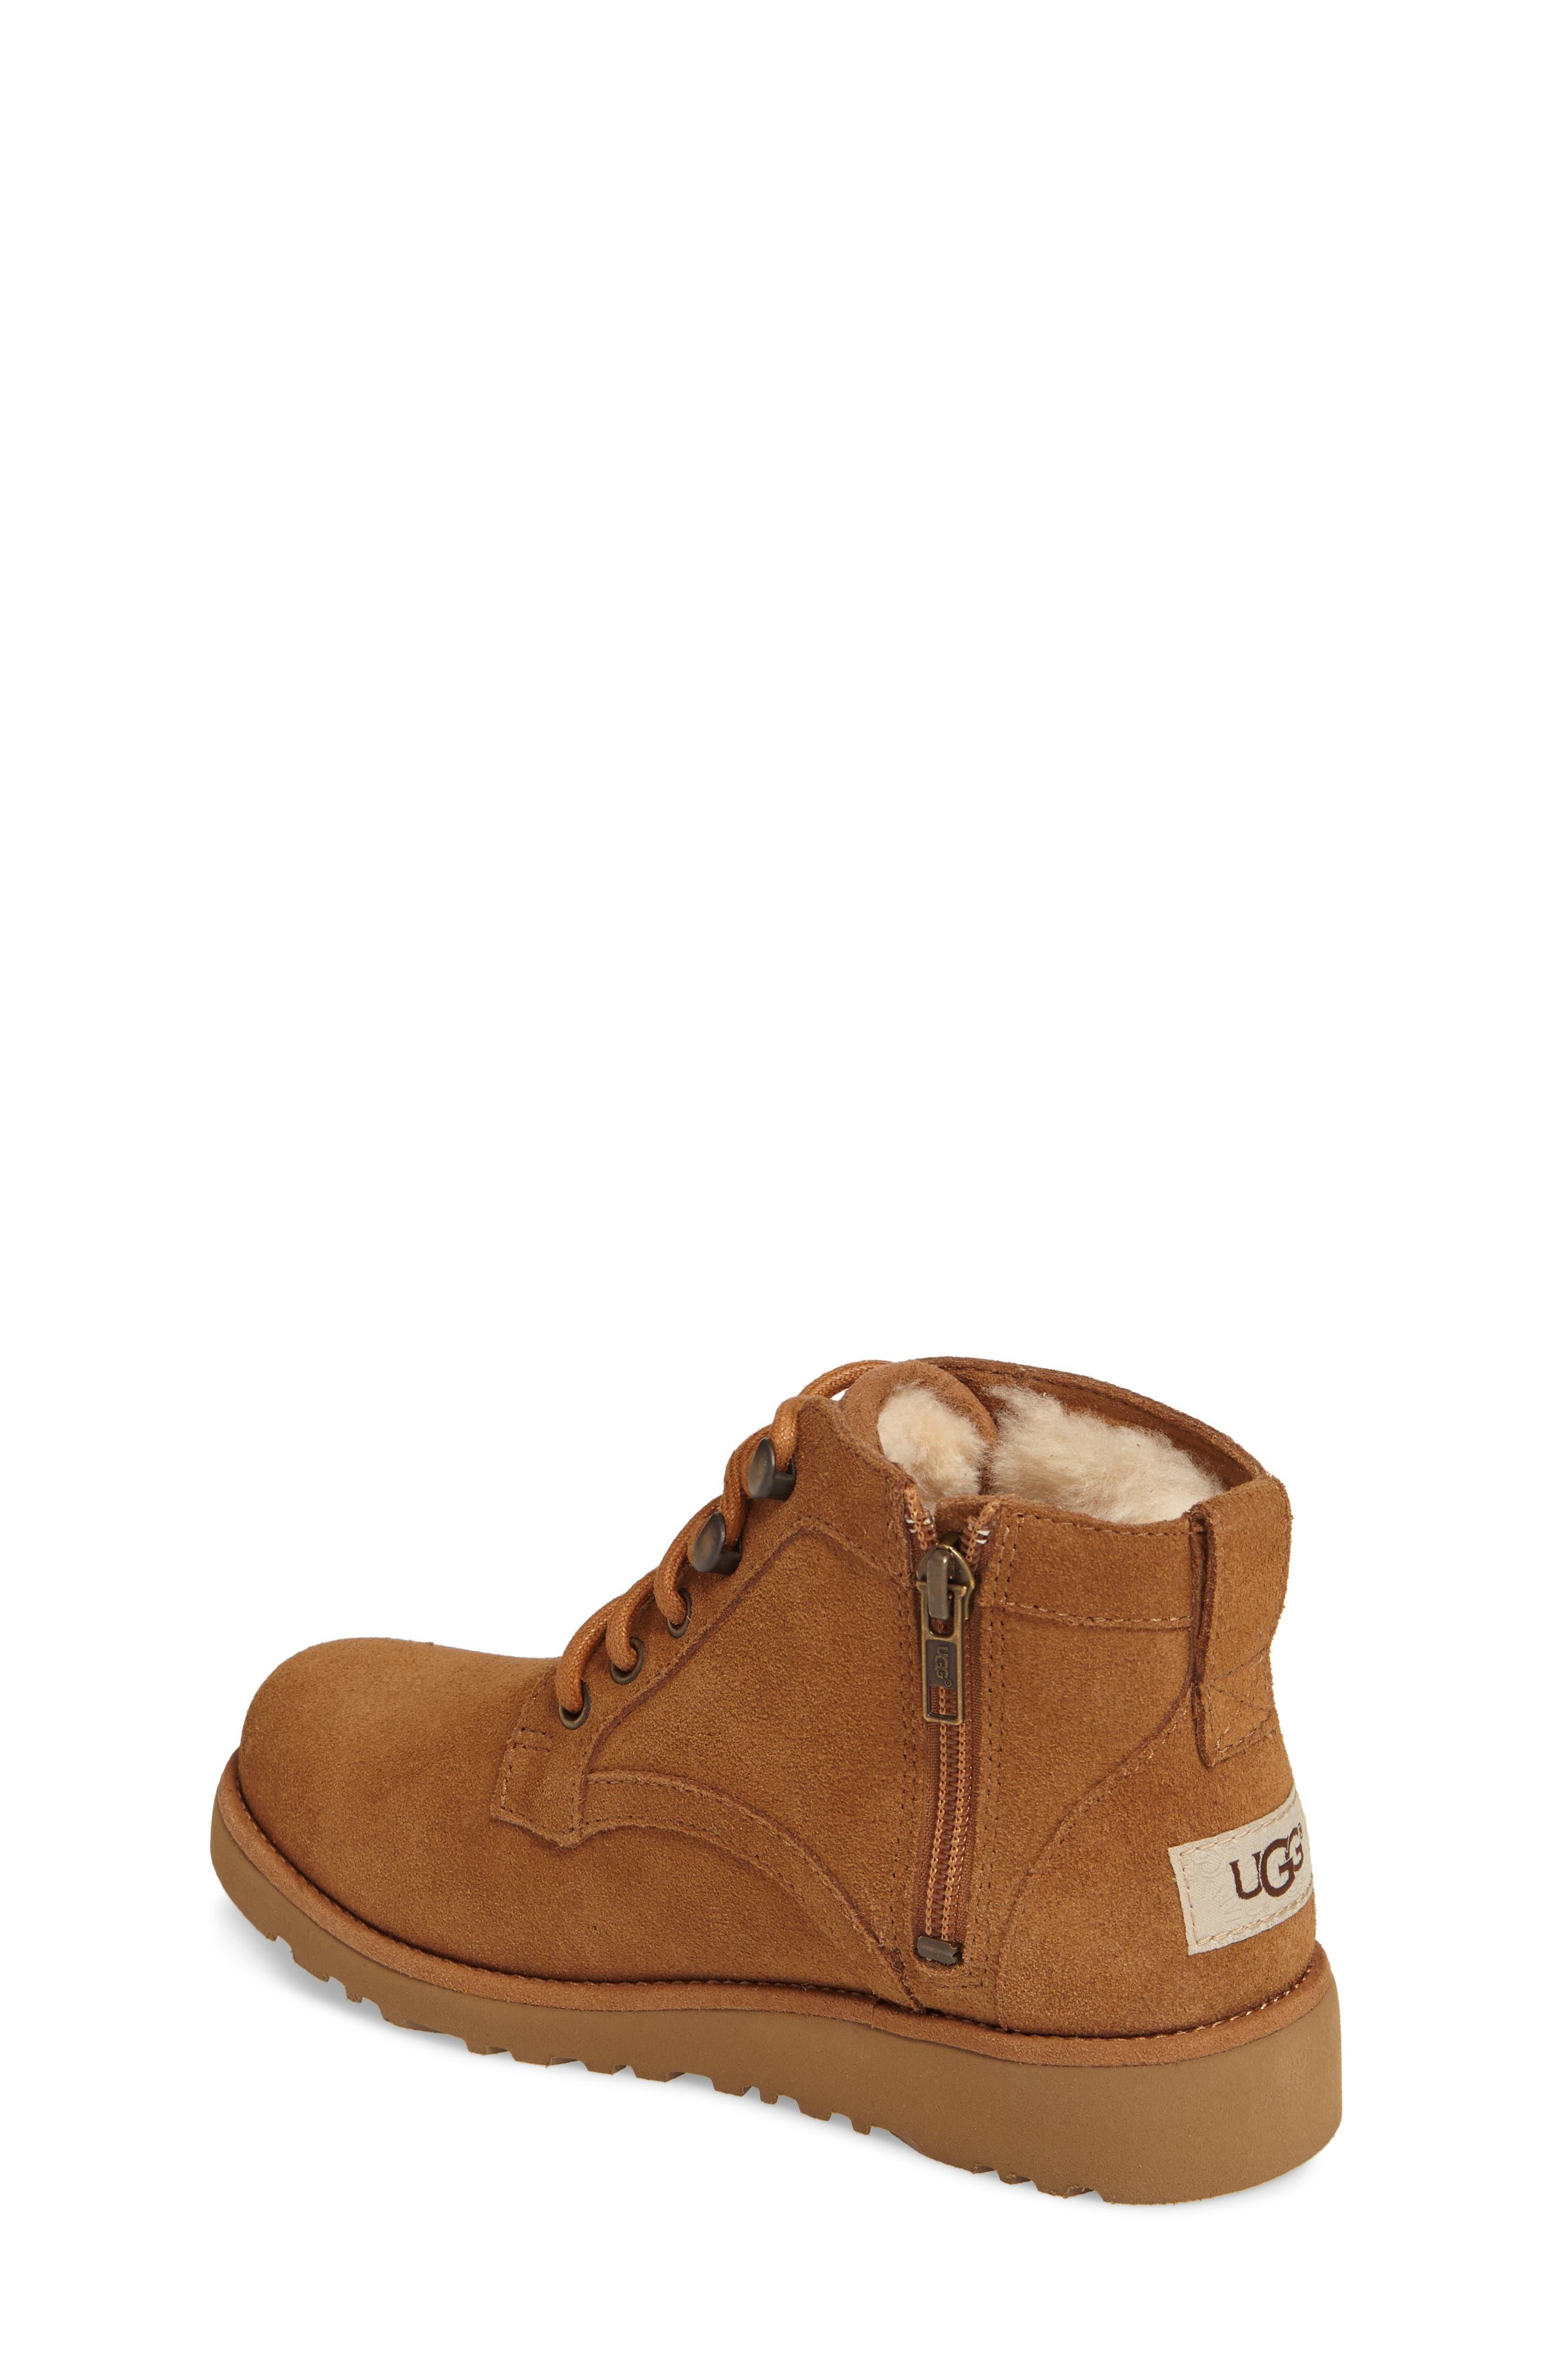 Alternate Image 2  - UGG® Banan Water-Resistant Genuine Shearling Boot (Little Kid & Big Kid)